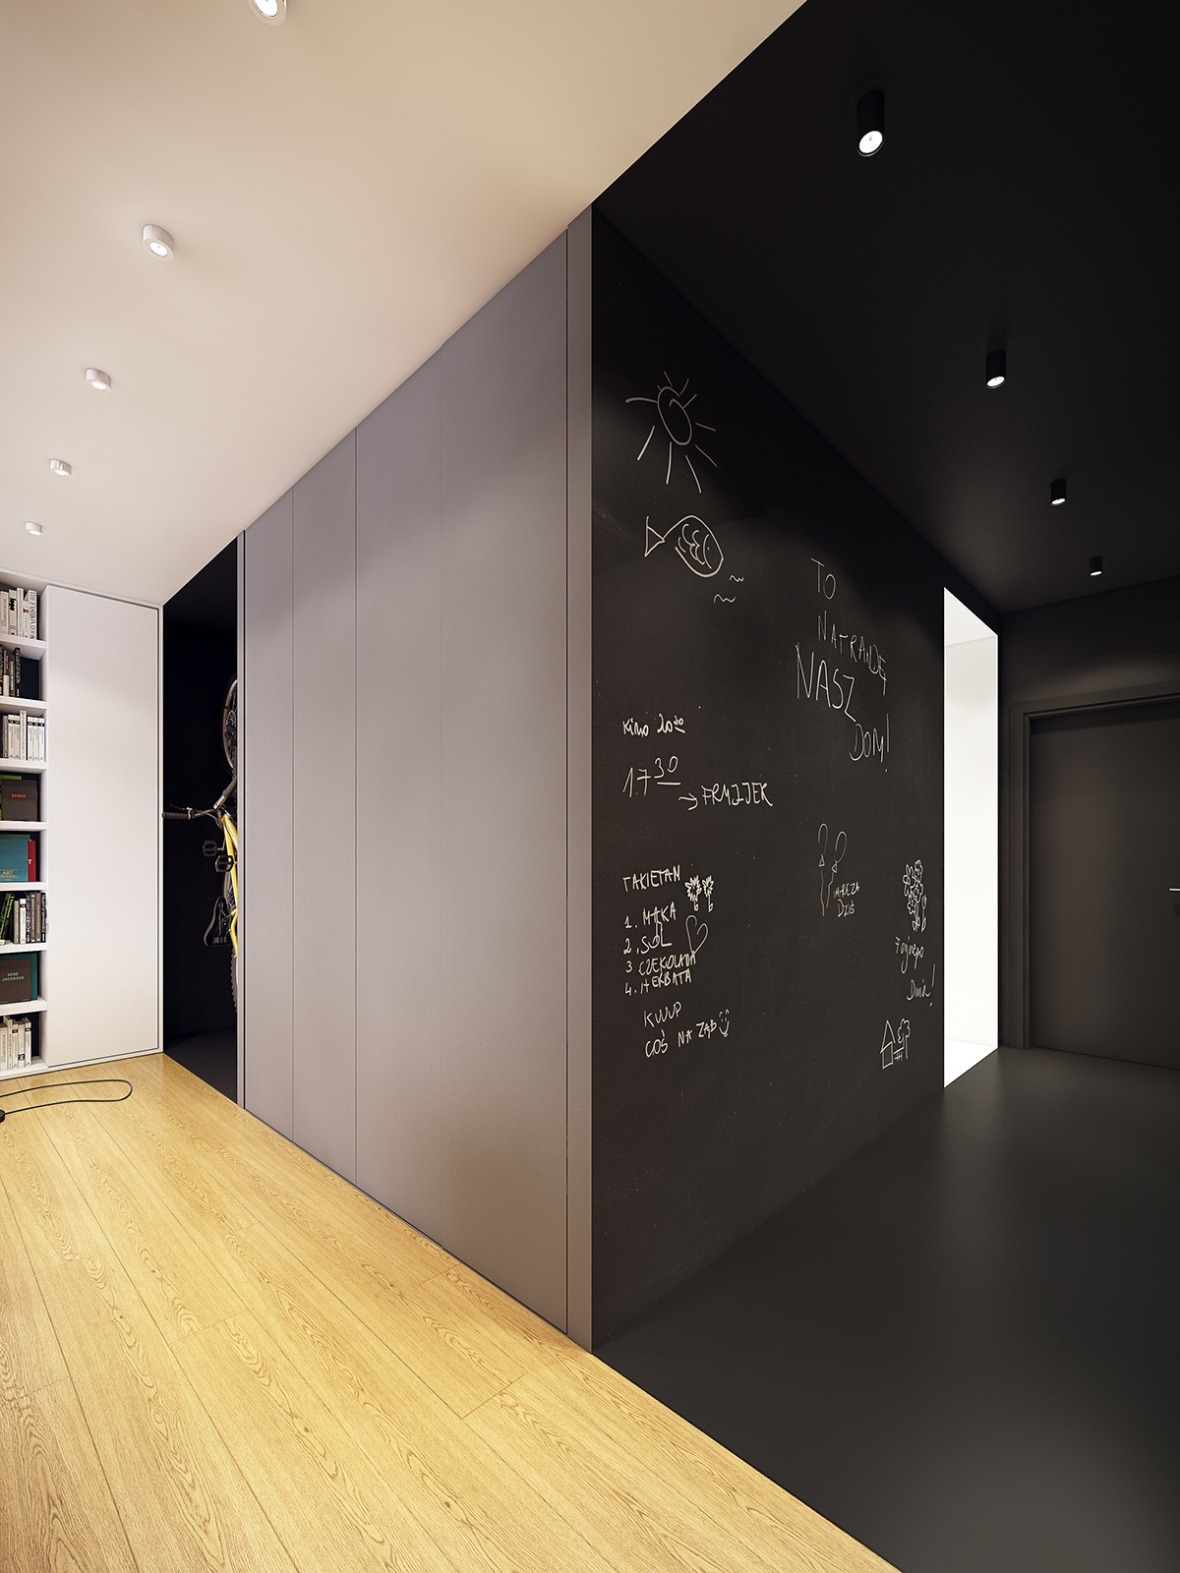 creative-chalkboard-wall-inspiration